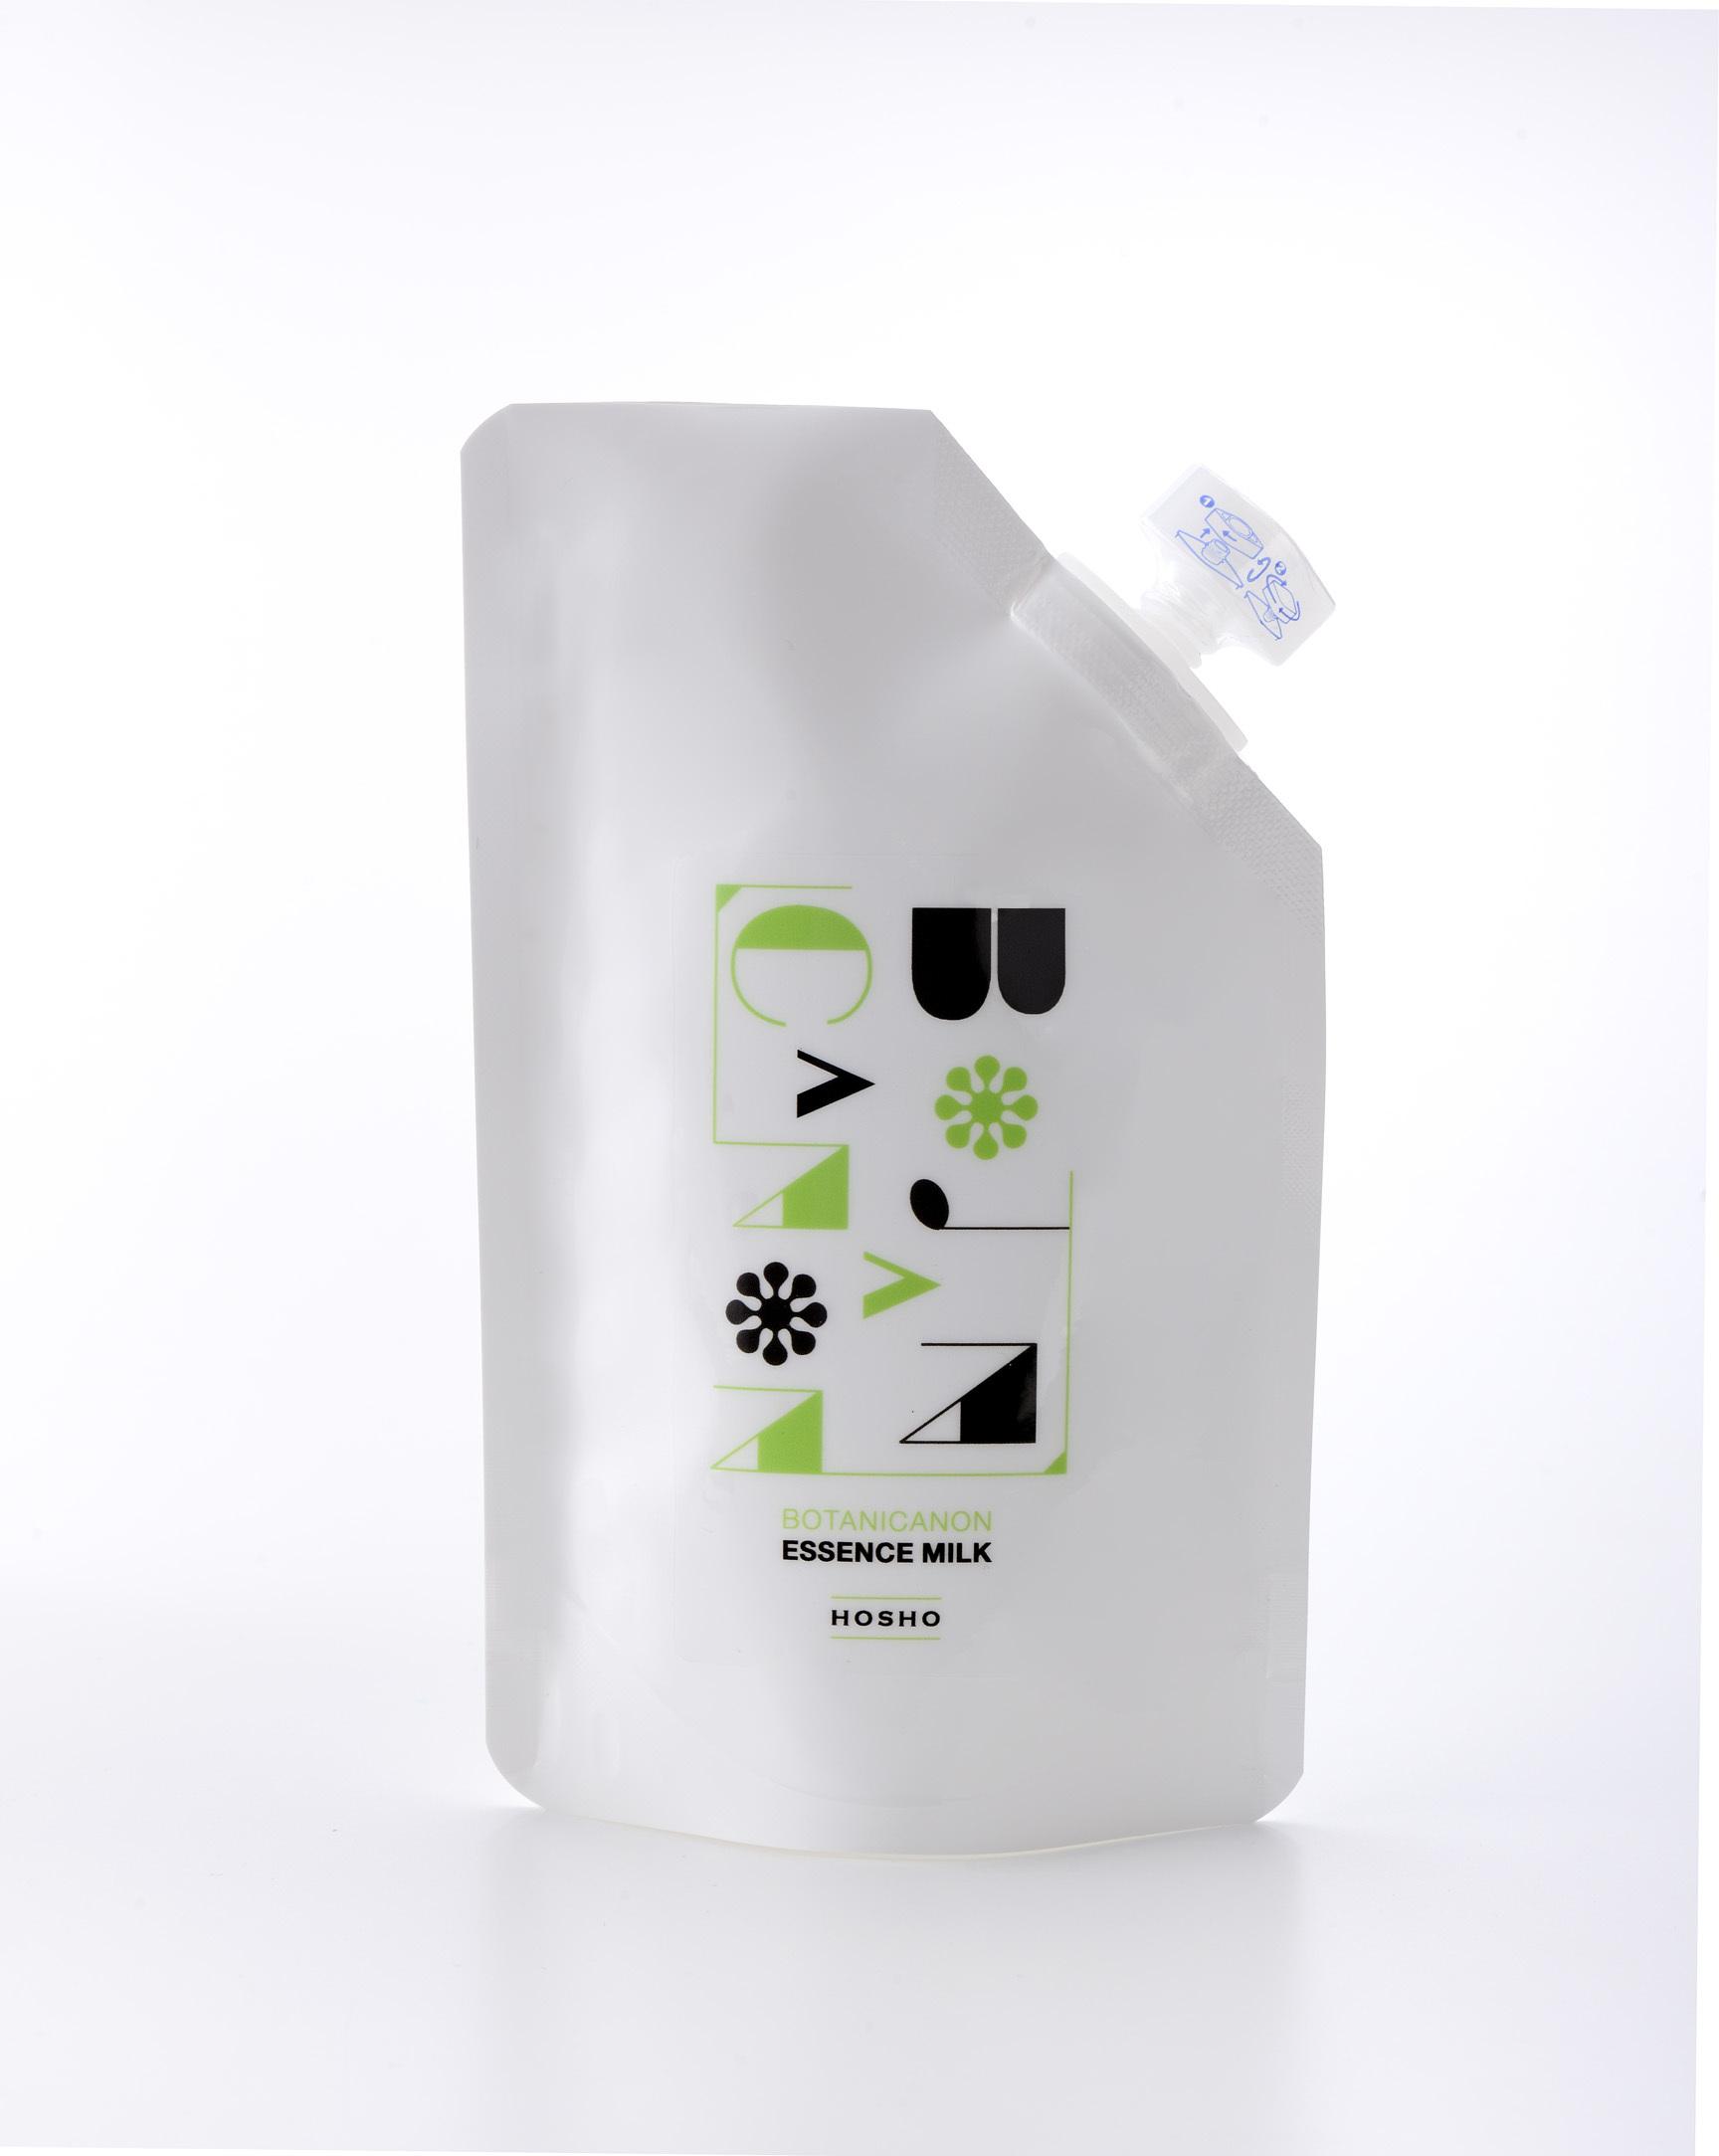 BOTANICANONハーバルエッセンスミルク(詰替用140ml)